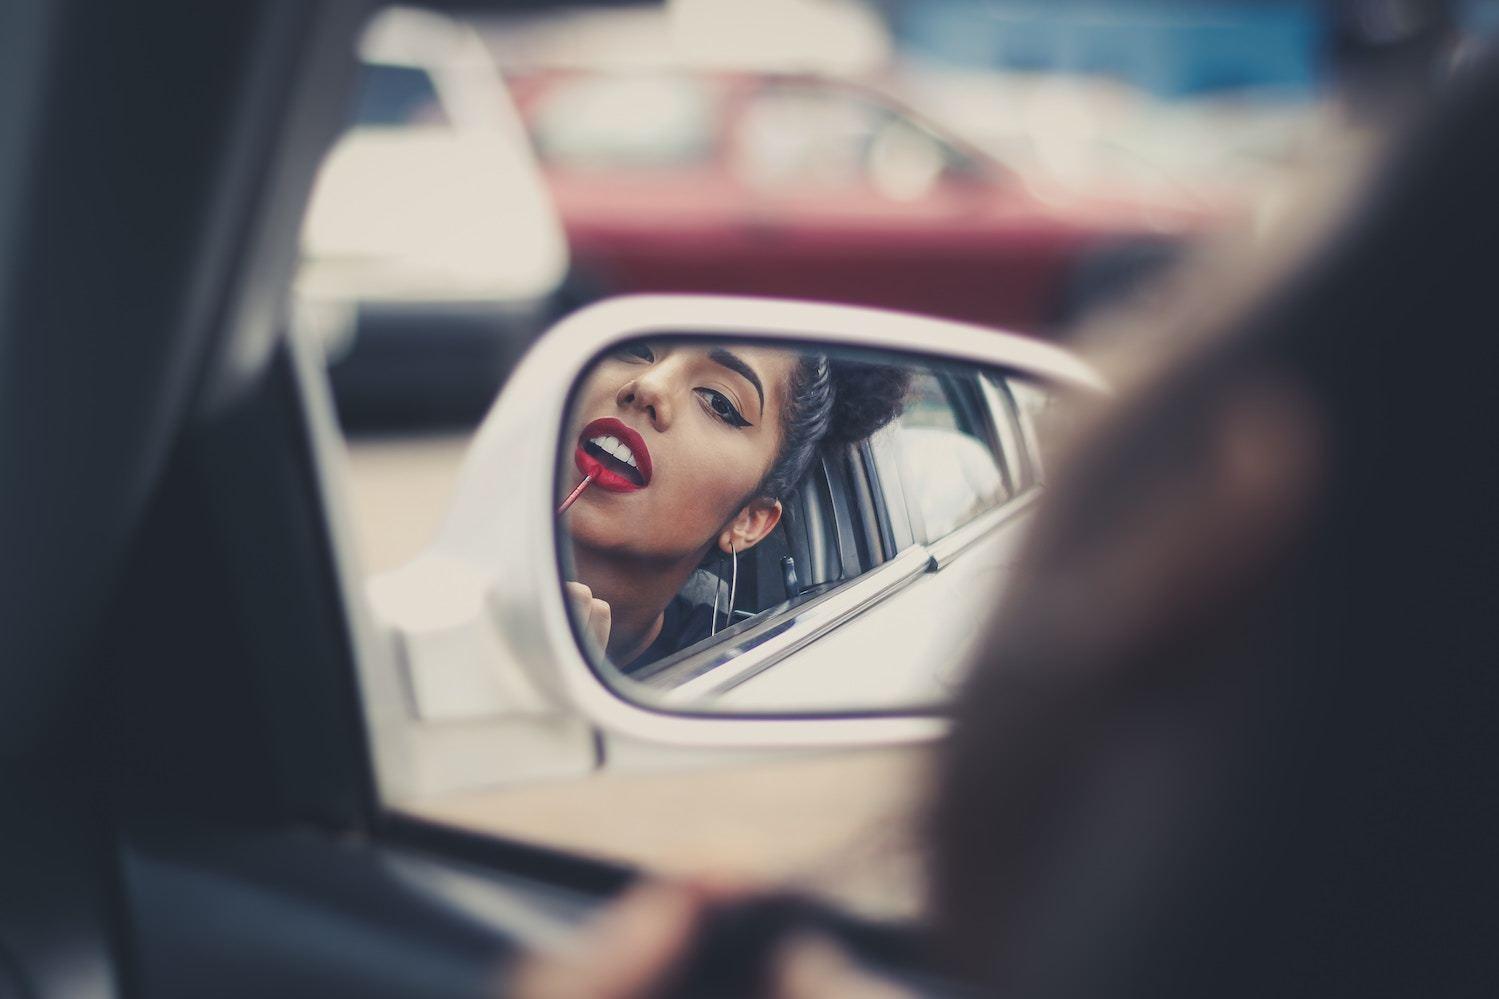 woman applies lipstick in car mirror